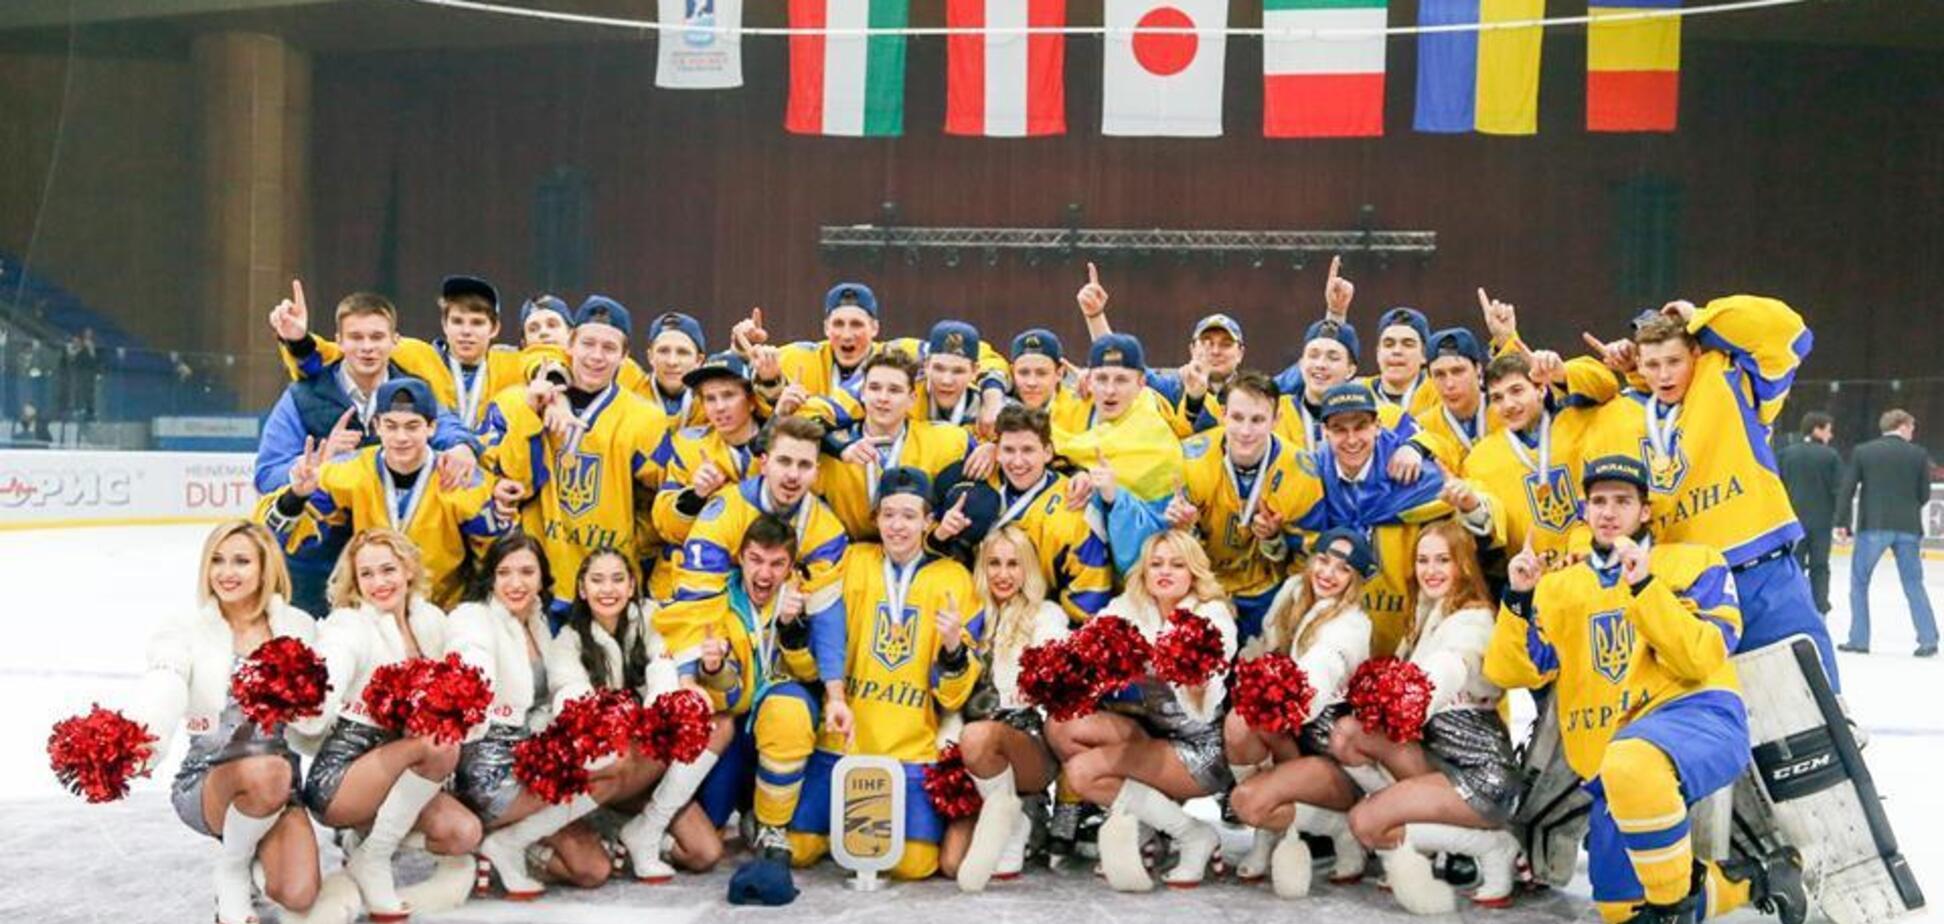 Палац спорту в Києві фантастично виконав гімн України на ЧС з хокею